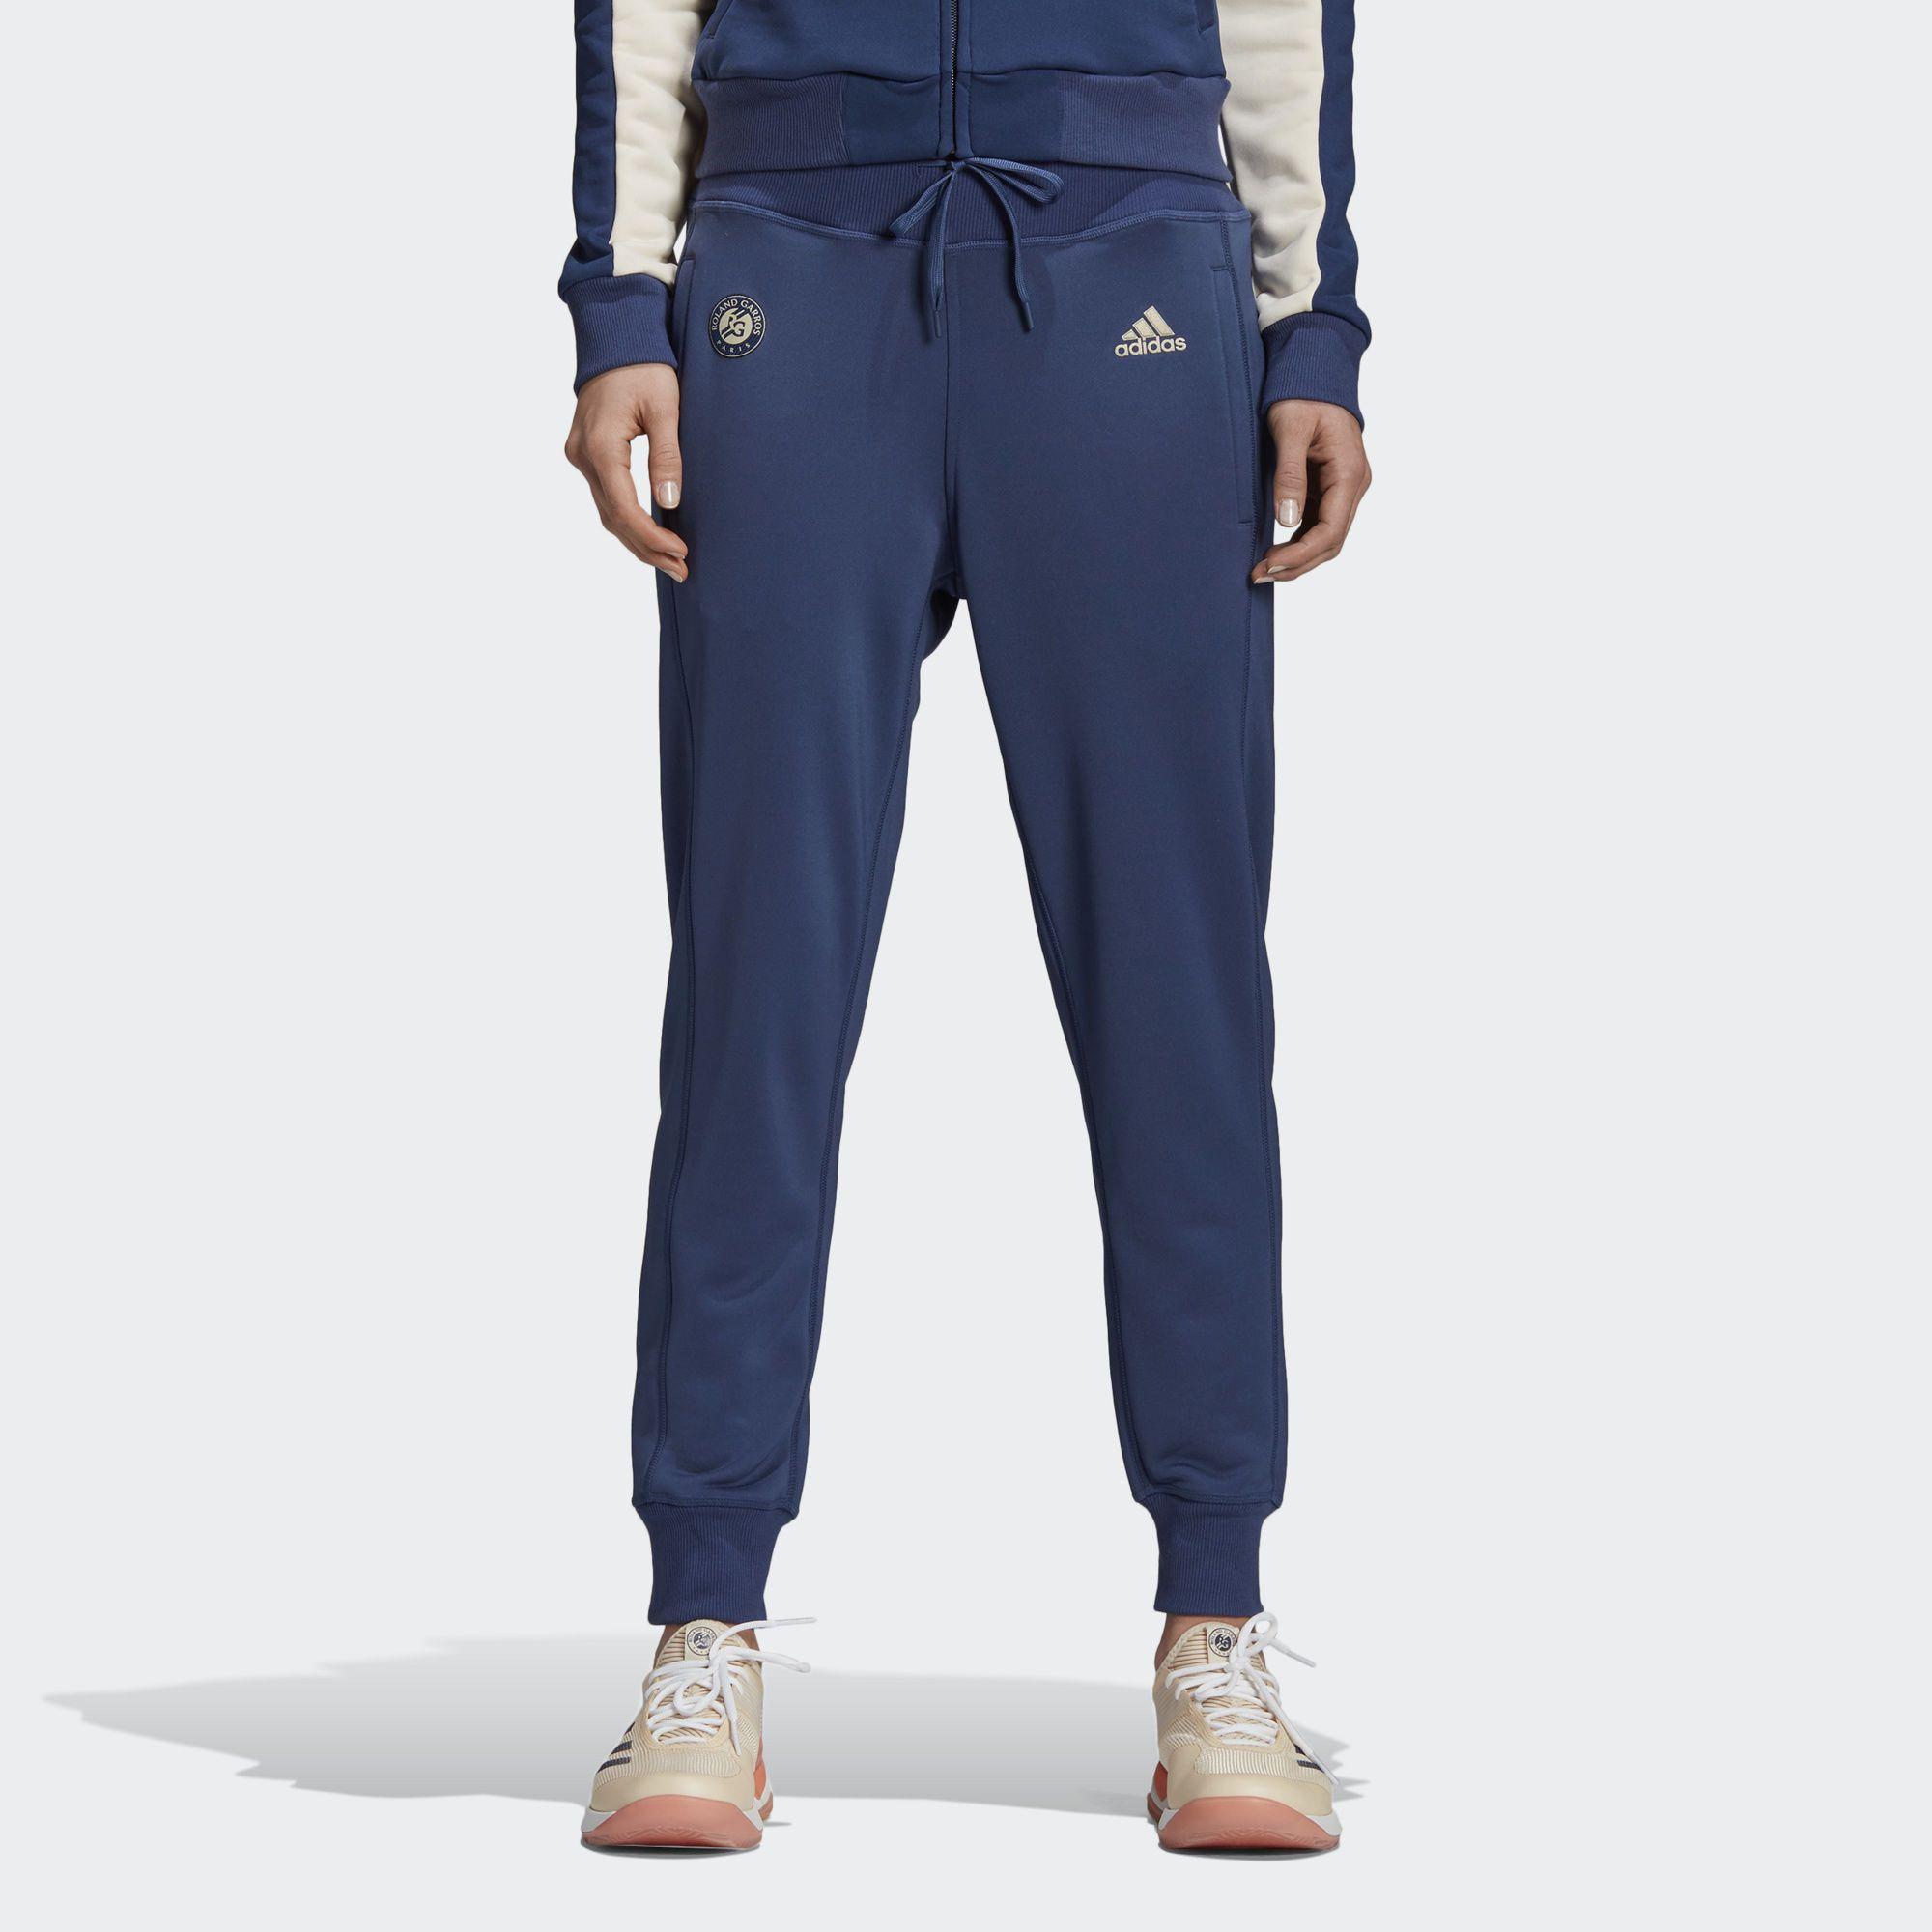 883ba1c55 adidas Roland Garros Pants - Blue